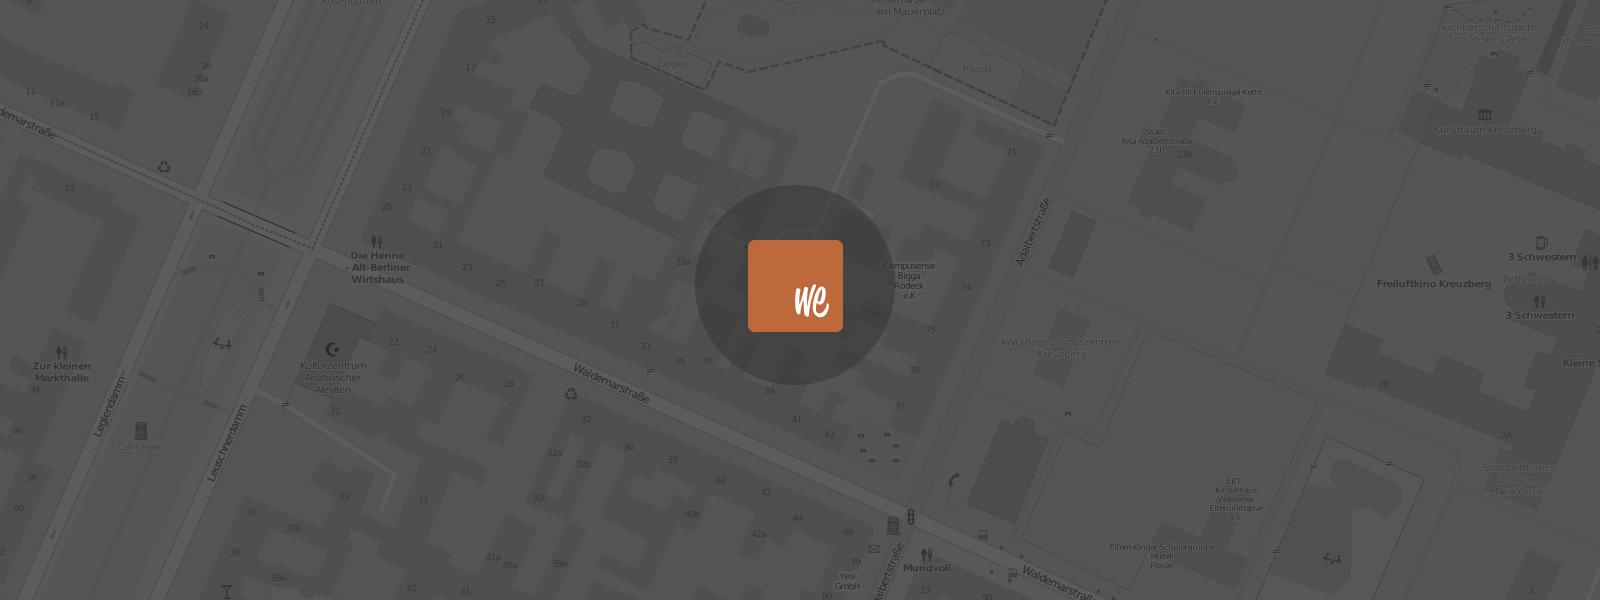 welance-map